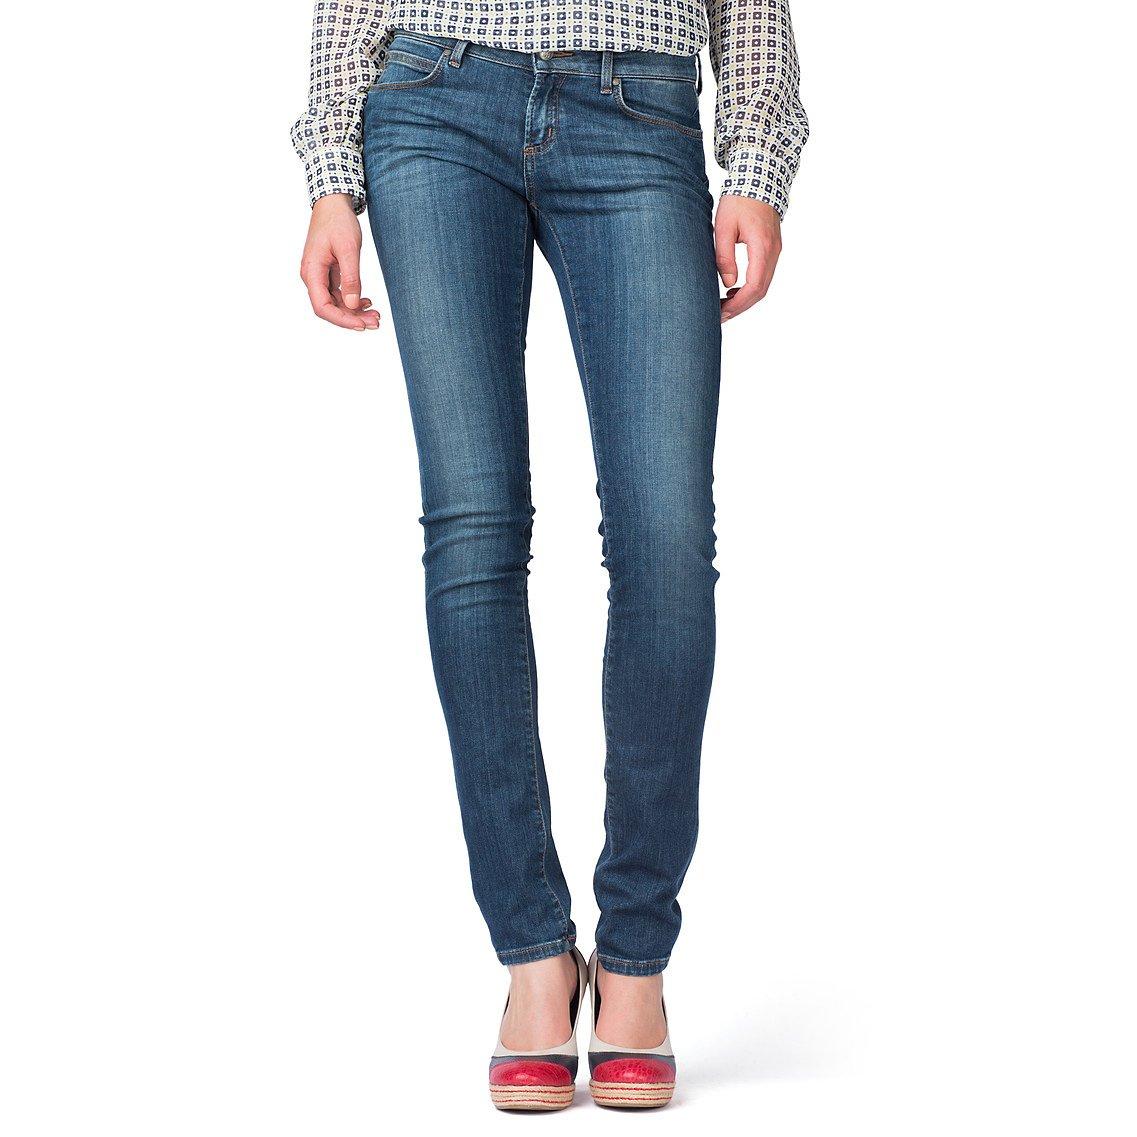 tommy hilfiger milan skinny jeans in blue willow lyst. Black Bedroom Furniture Sets. Home Design Ideas